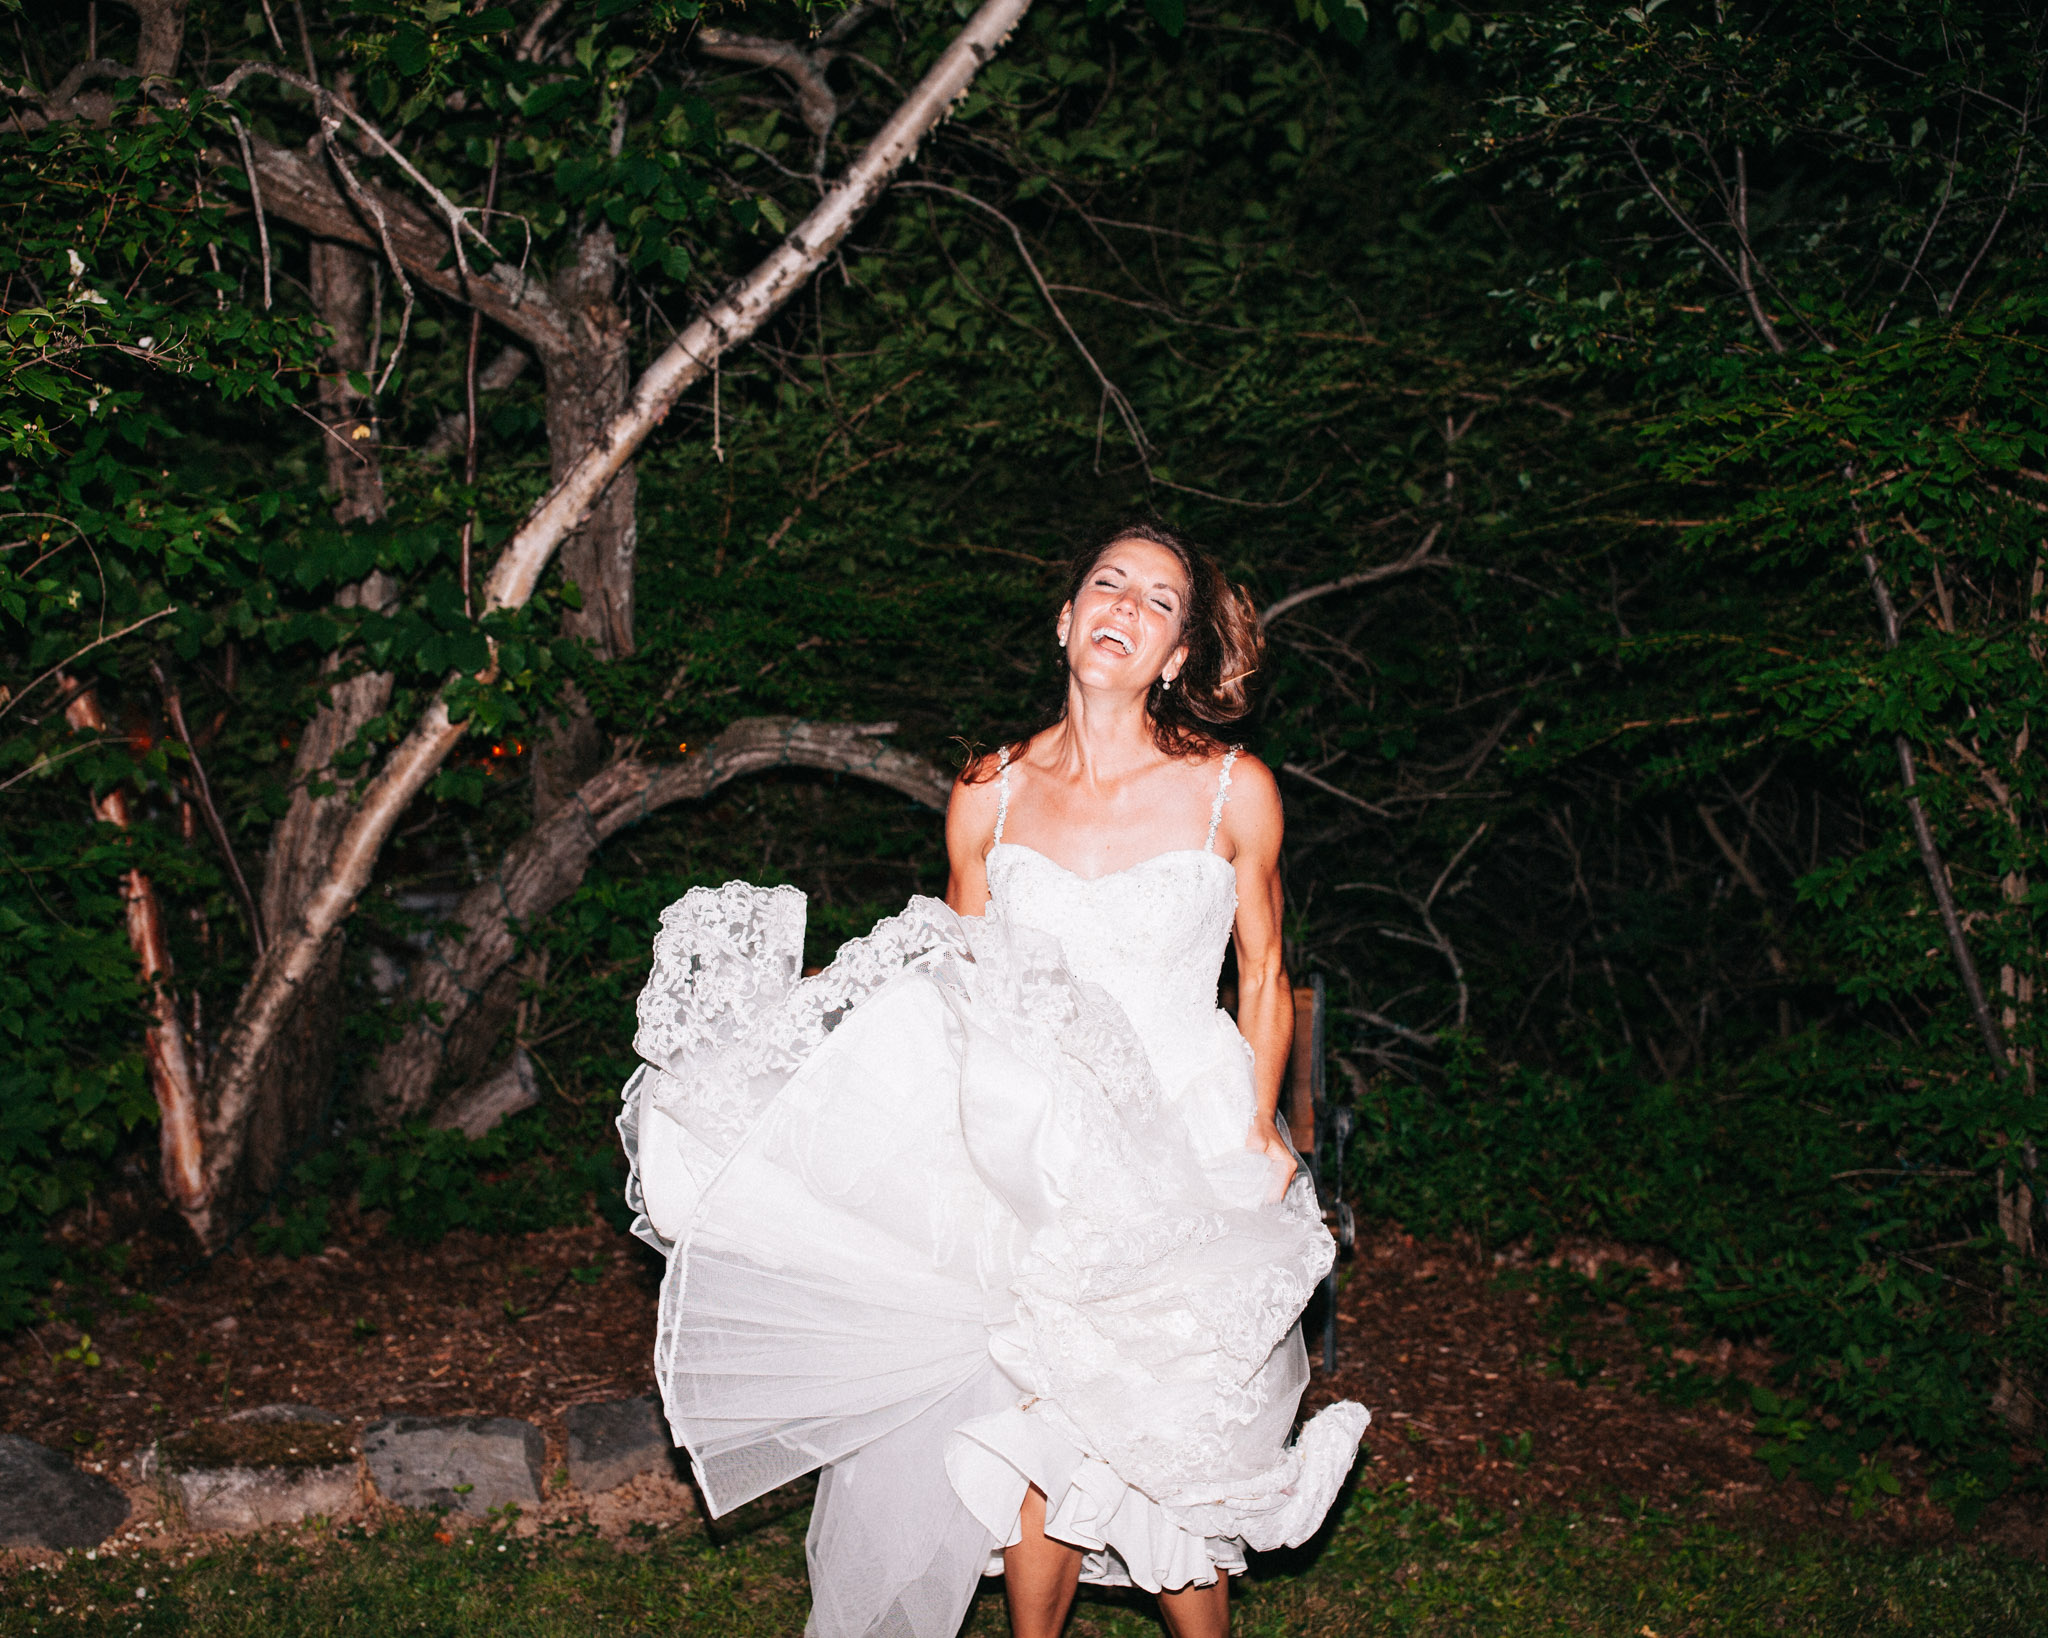 bride having fun photobooth